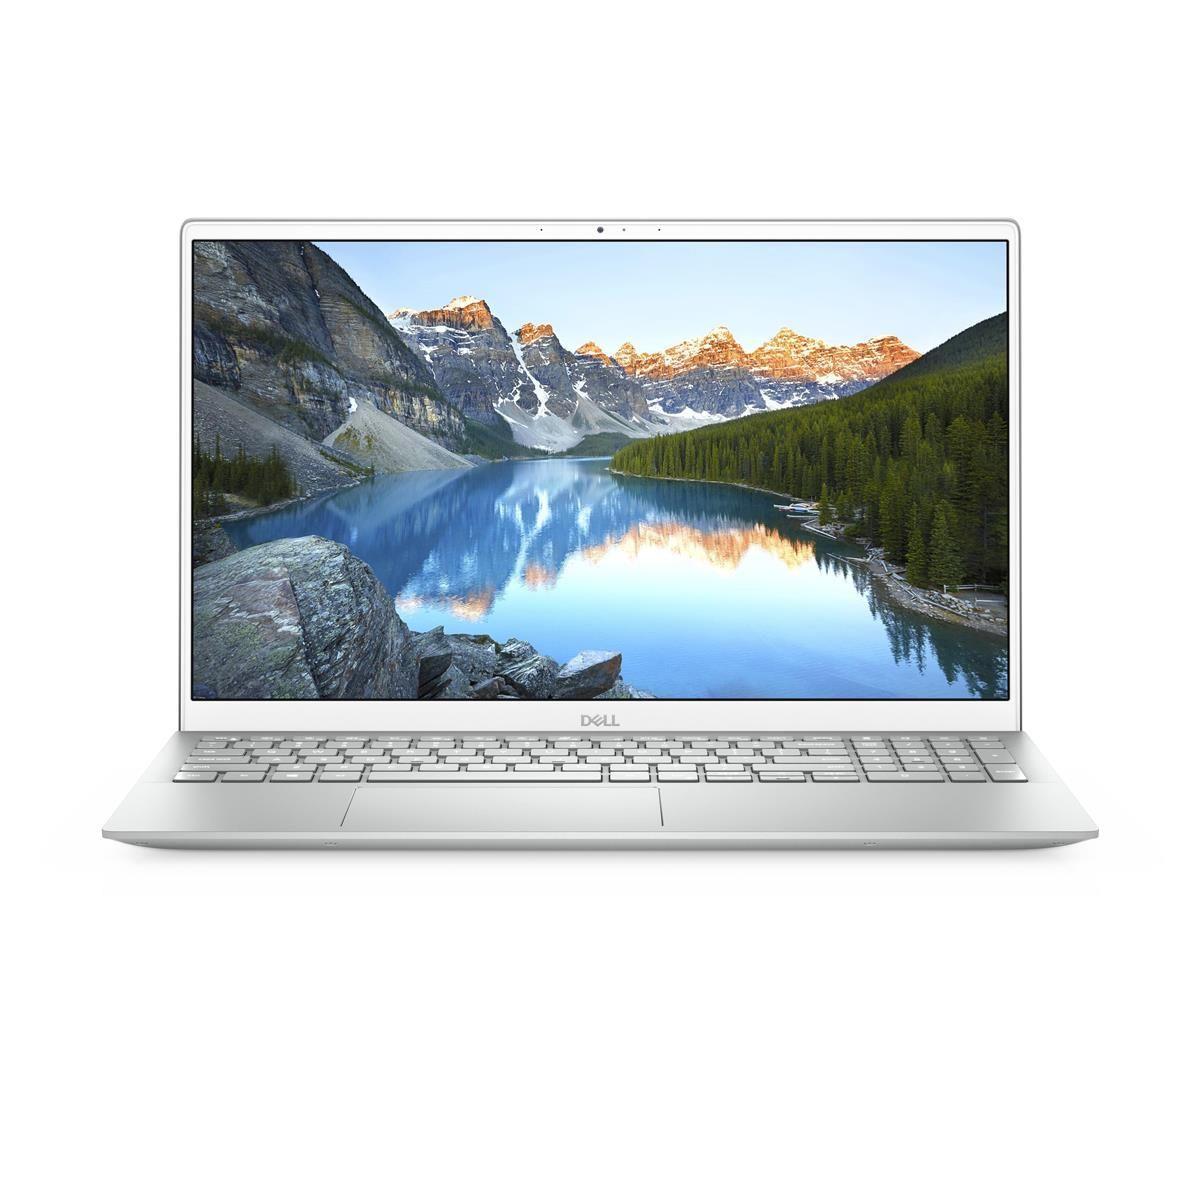 Notebook Dell Inspiron 15 5501 15,6 cal FHD i5-1035G1 8GB SSD512GB UHD620 W10 Silver